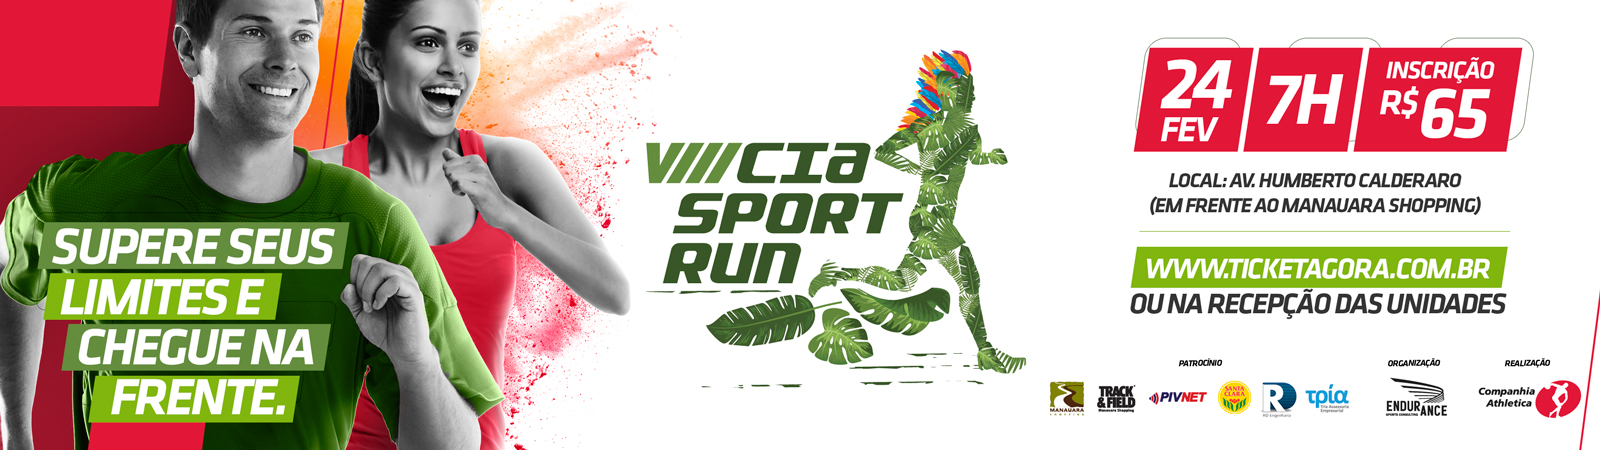 VIII Cia Sports Run